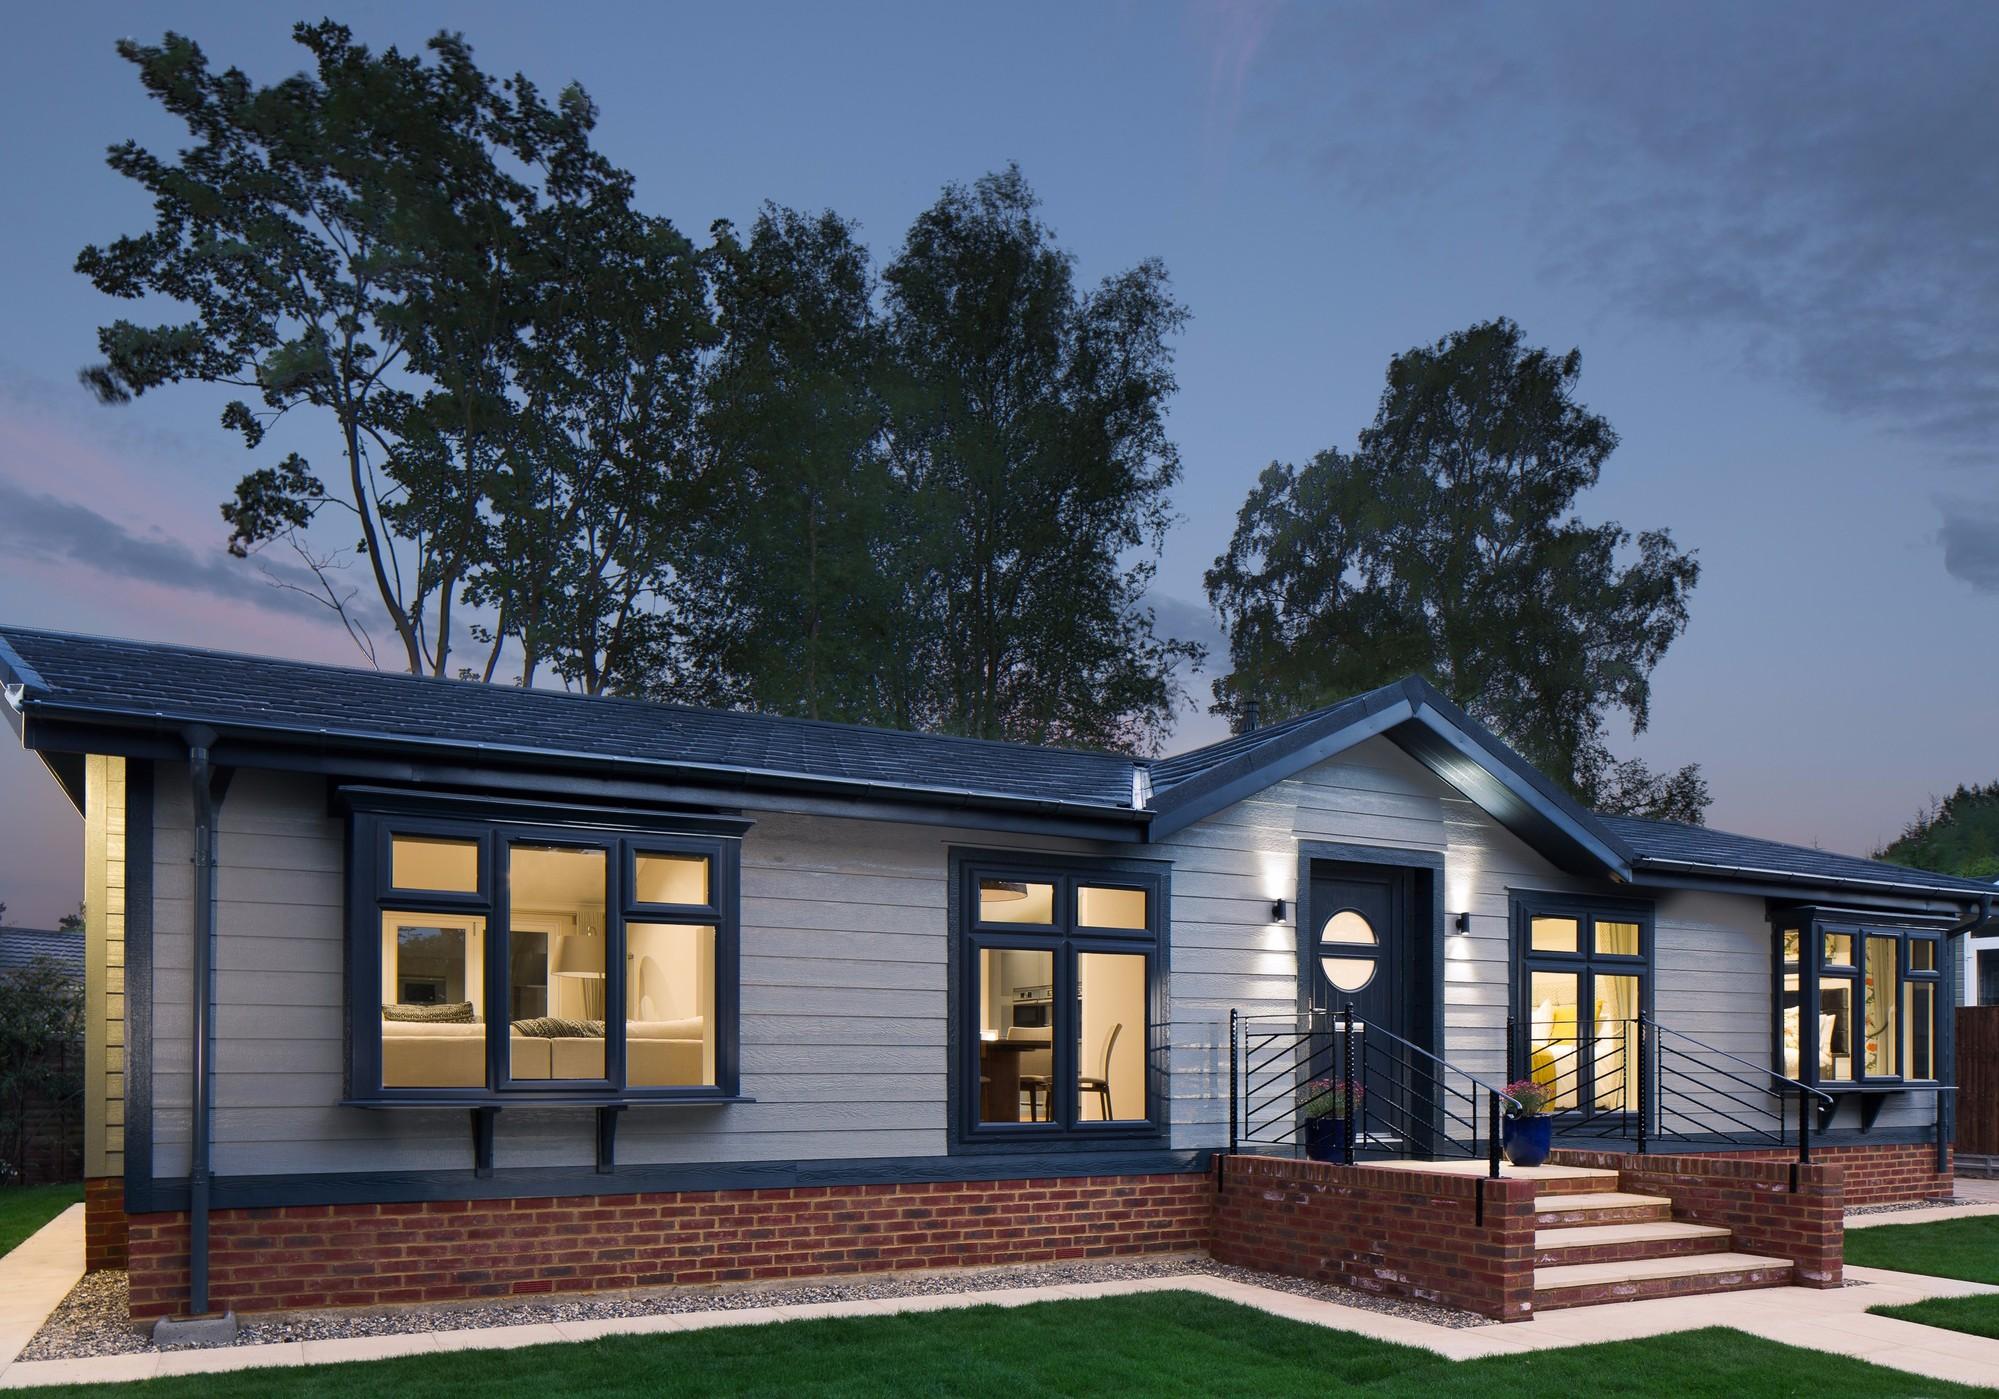 warfield park berkshire park home development park home exterior